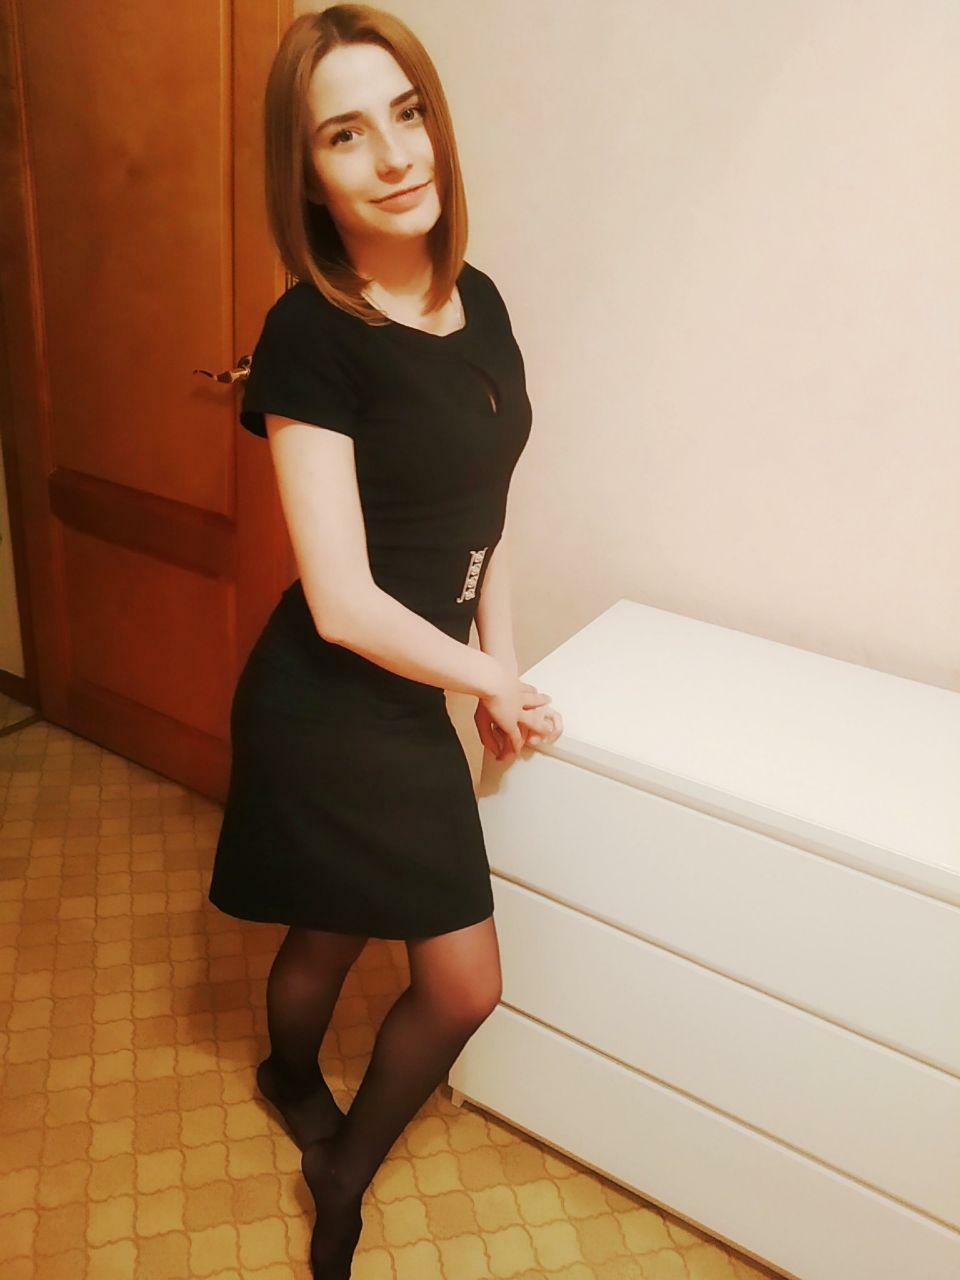 photo2367.jpg